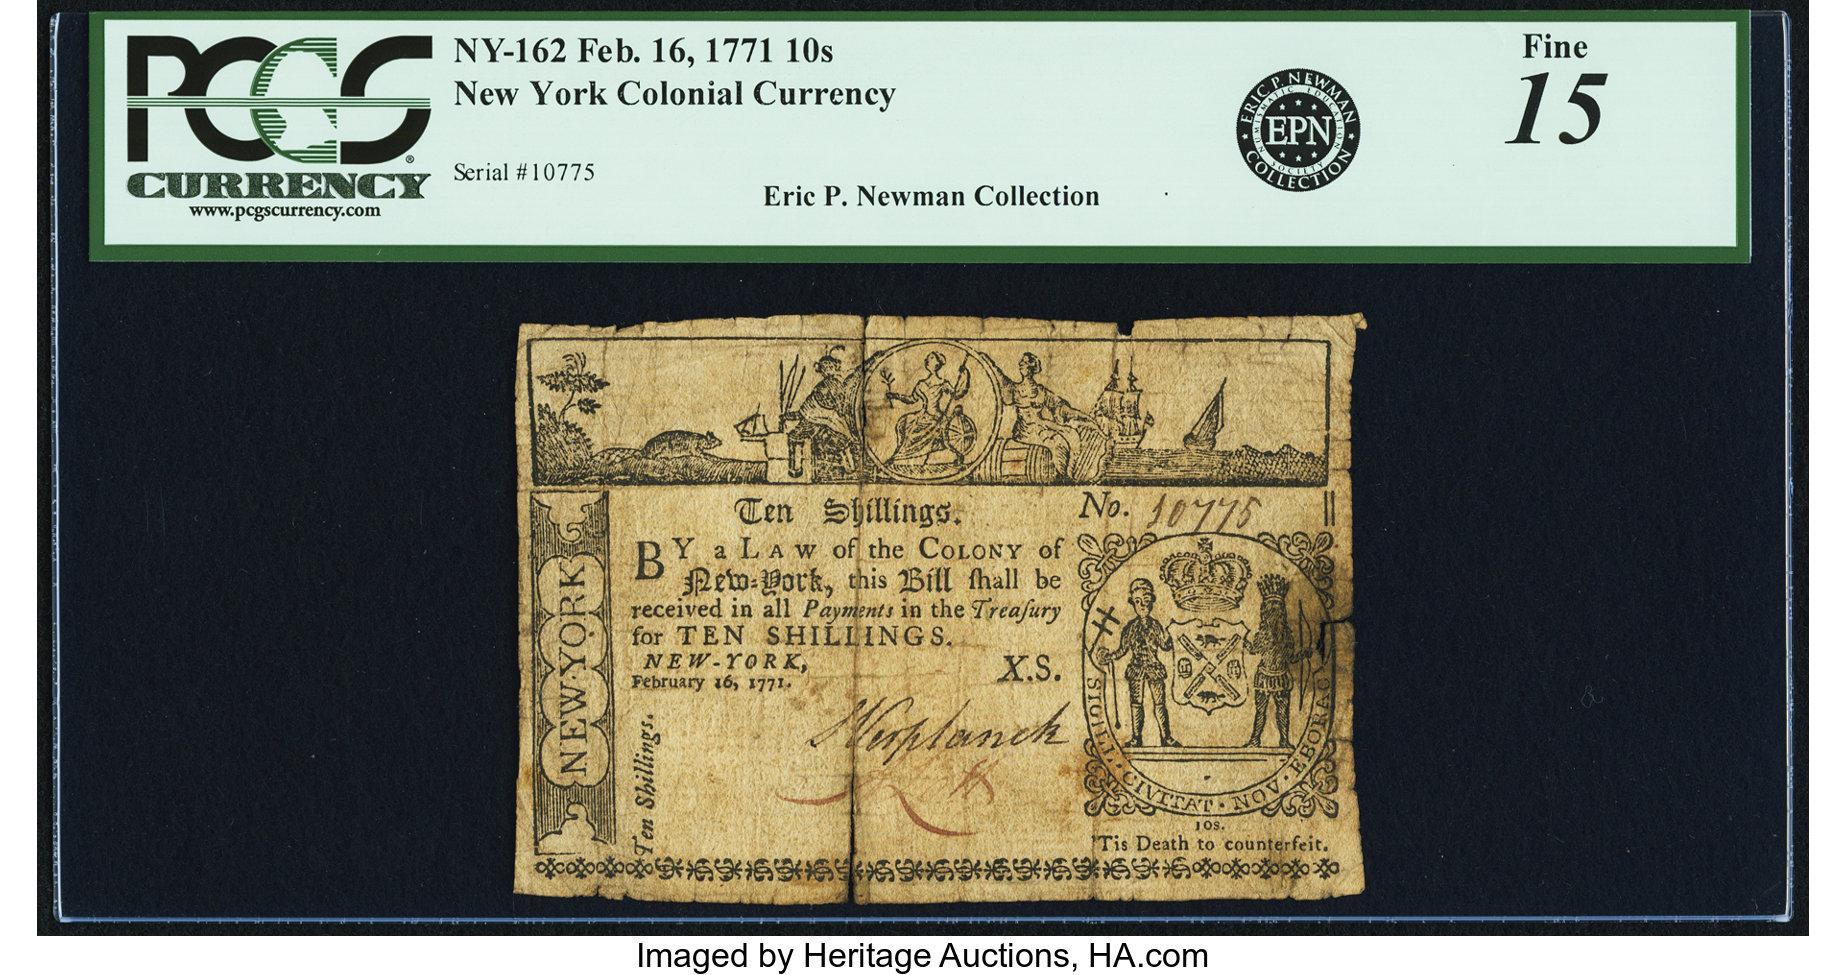 sample image for 1771 16-Feb 10S (Fr.# NY162)